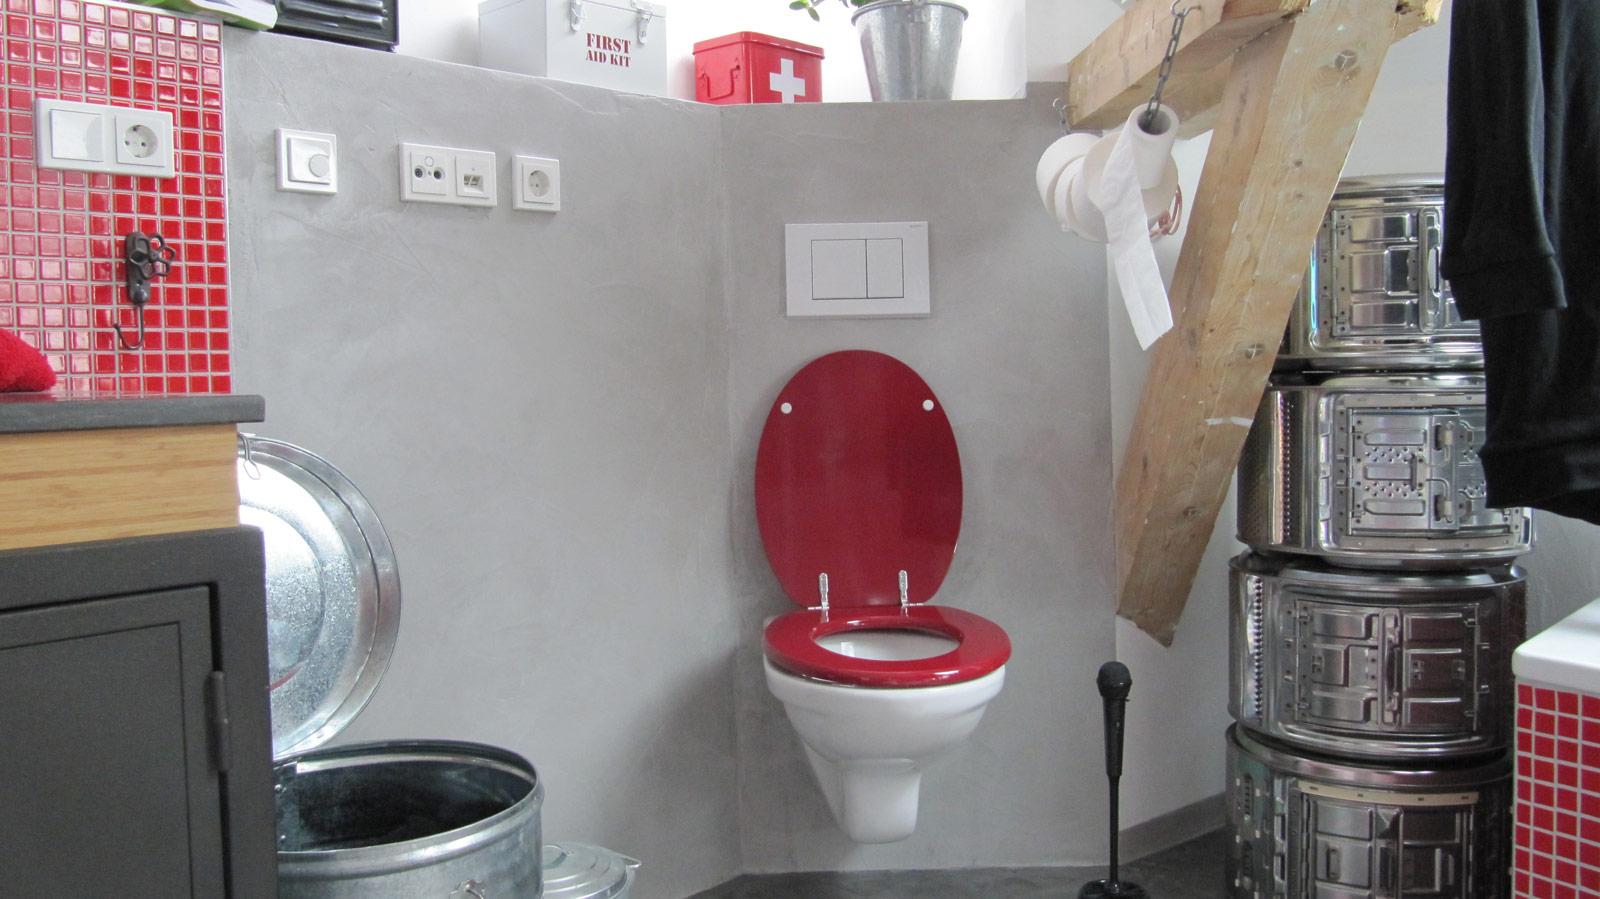 Toilet Beton Cire : Beton cire wall floor maler mittelhessen giessen maler mittelhessen